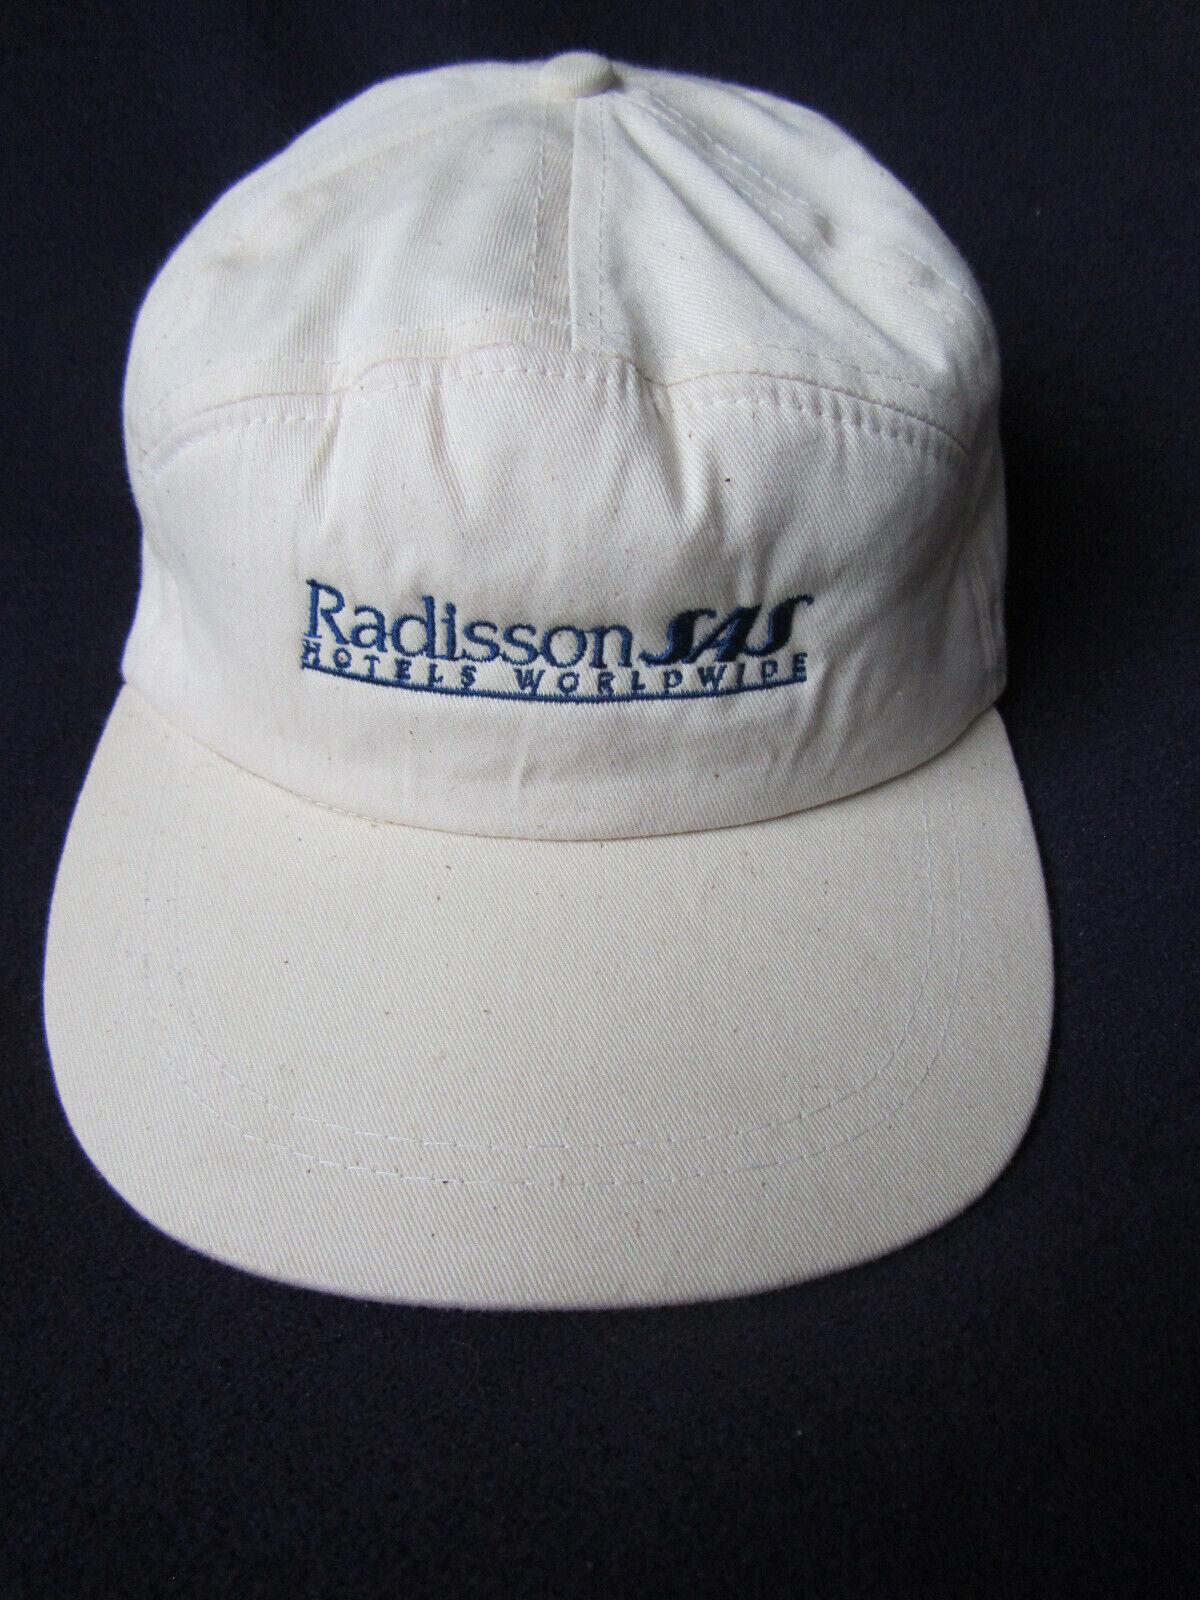 Baseball Cap Radisson SAS Hotel neu selten Sammlungsauflösung